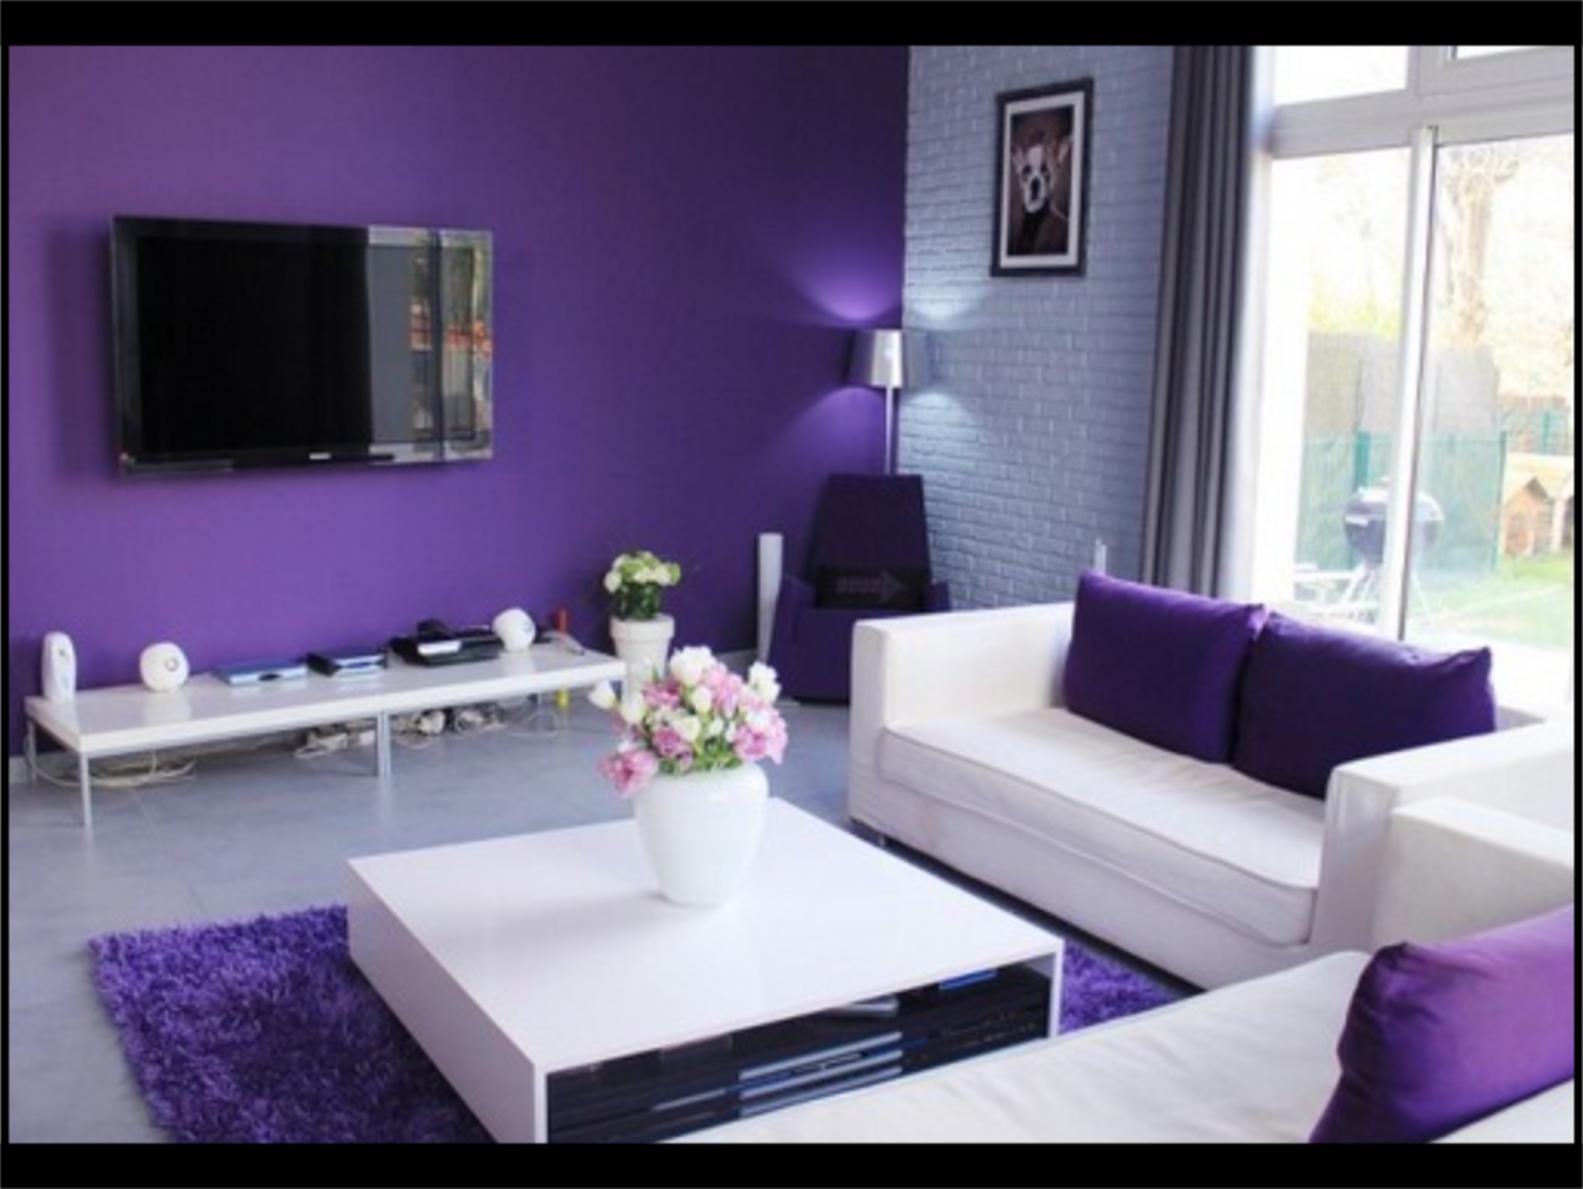 Gambar Foto Interior Rumah Minimalis Cat Warna Ungu Kombinasi